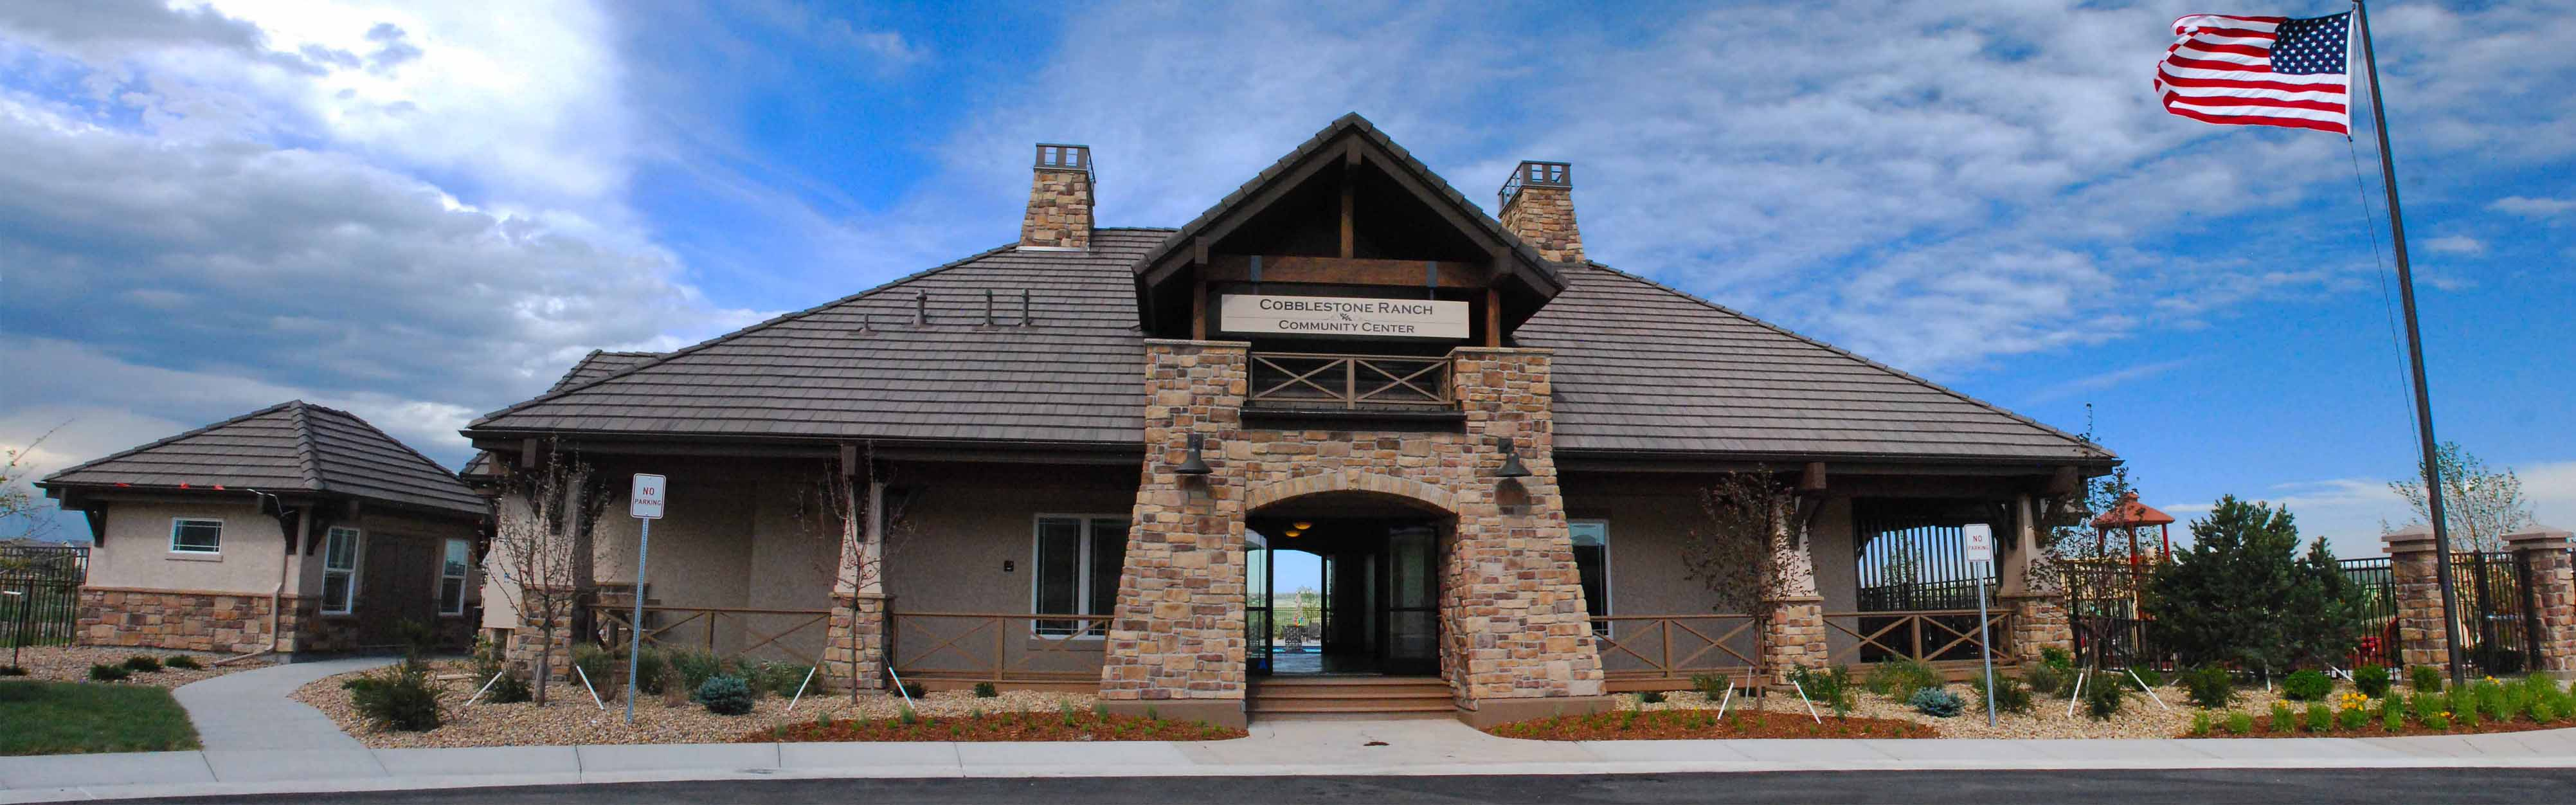 Pool House Architecture Design In Denver Colorado